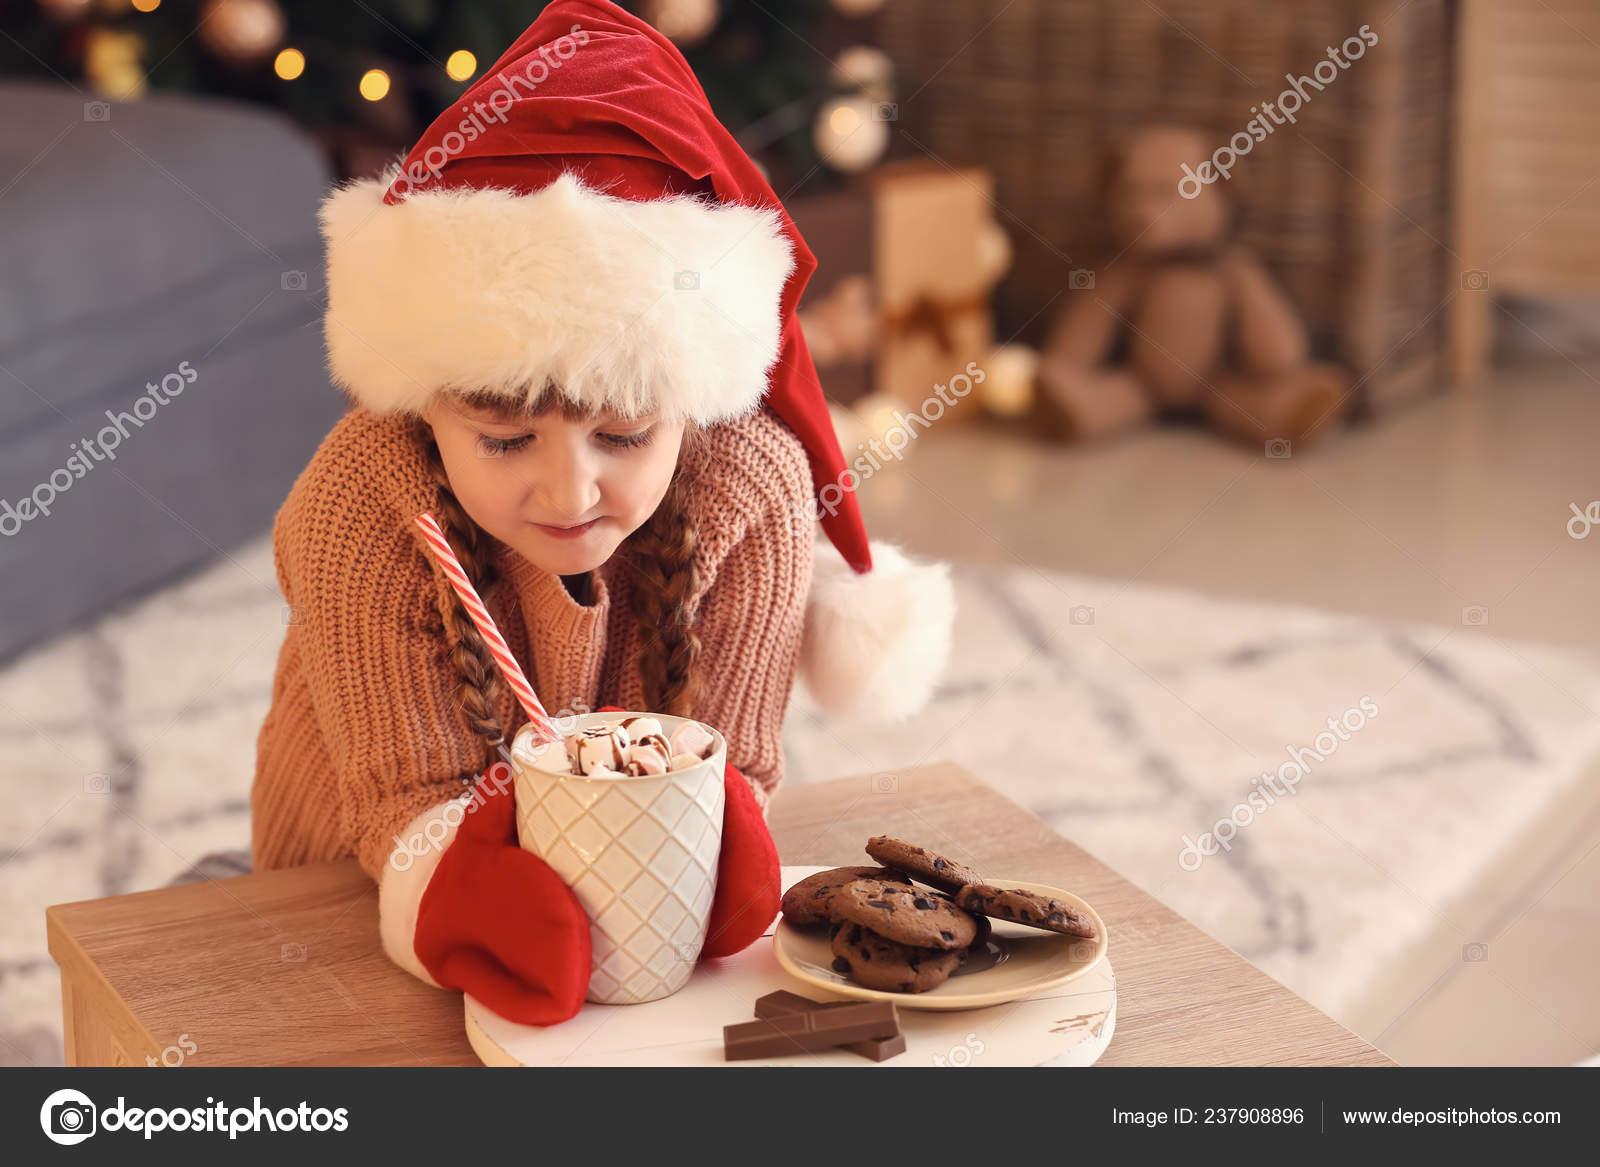 Cute Little Girl Santa Hat Hot Chocolate Cookies Home Christmas